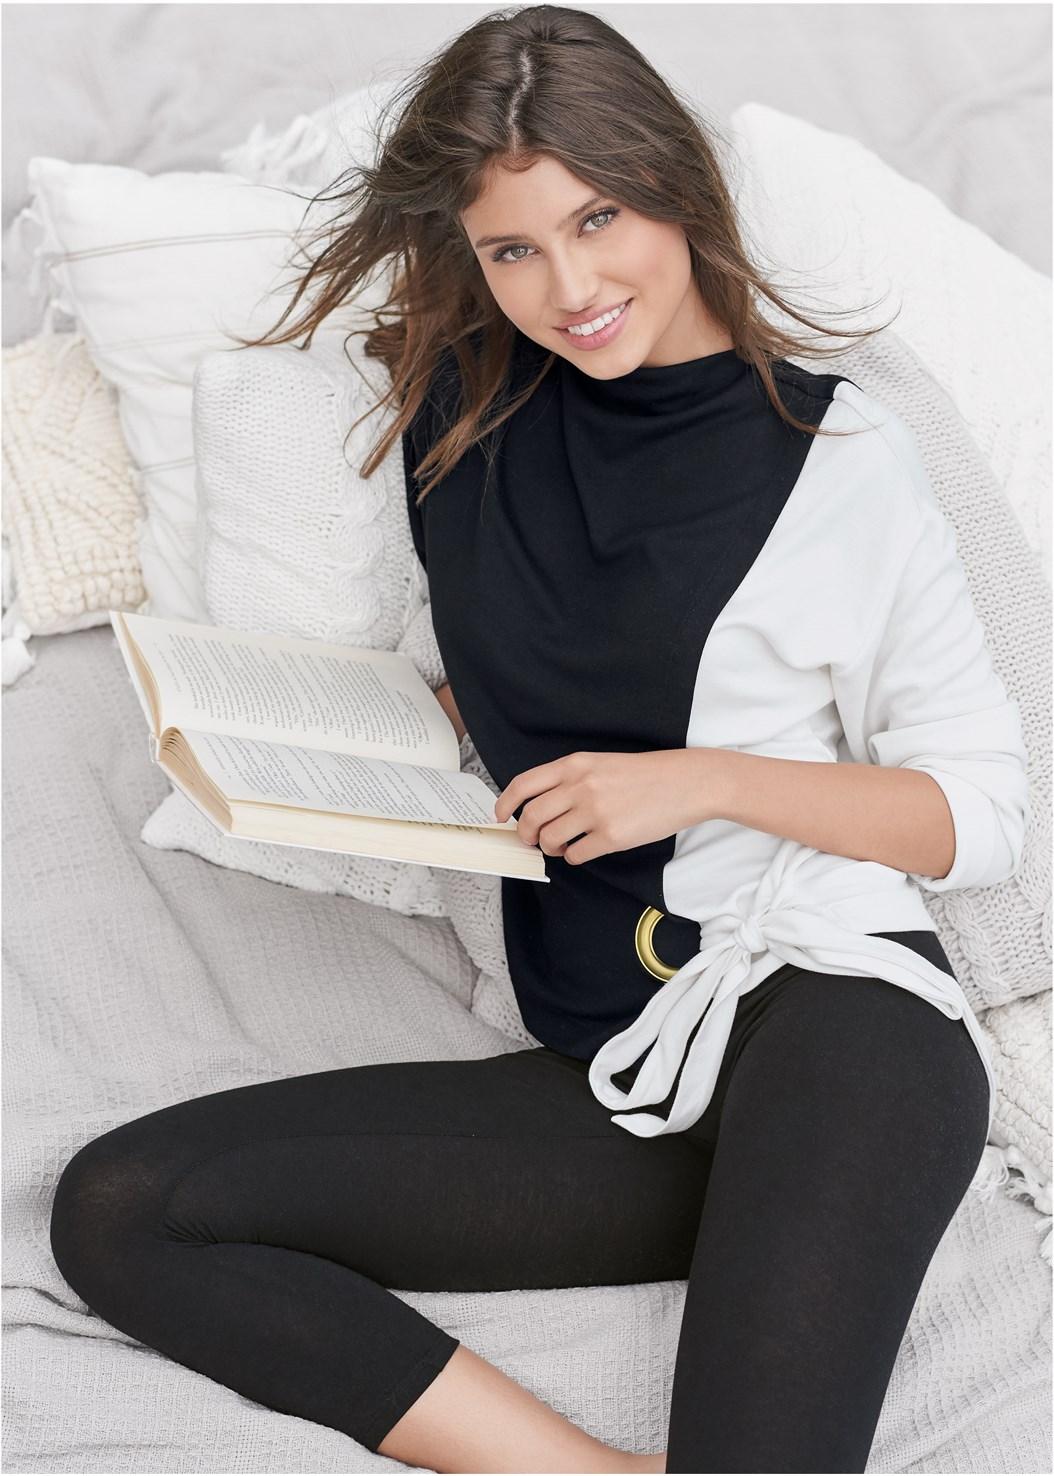 Color Block Sweatshirt,Capri Legging Two Pack,Mid Rise Slimming Stretch Jeggings,Seamless Unlined Bra,Square Hoop Earrings